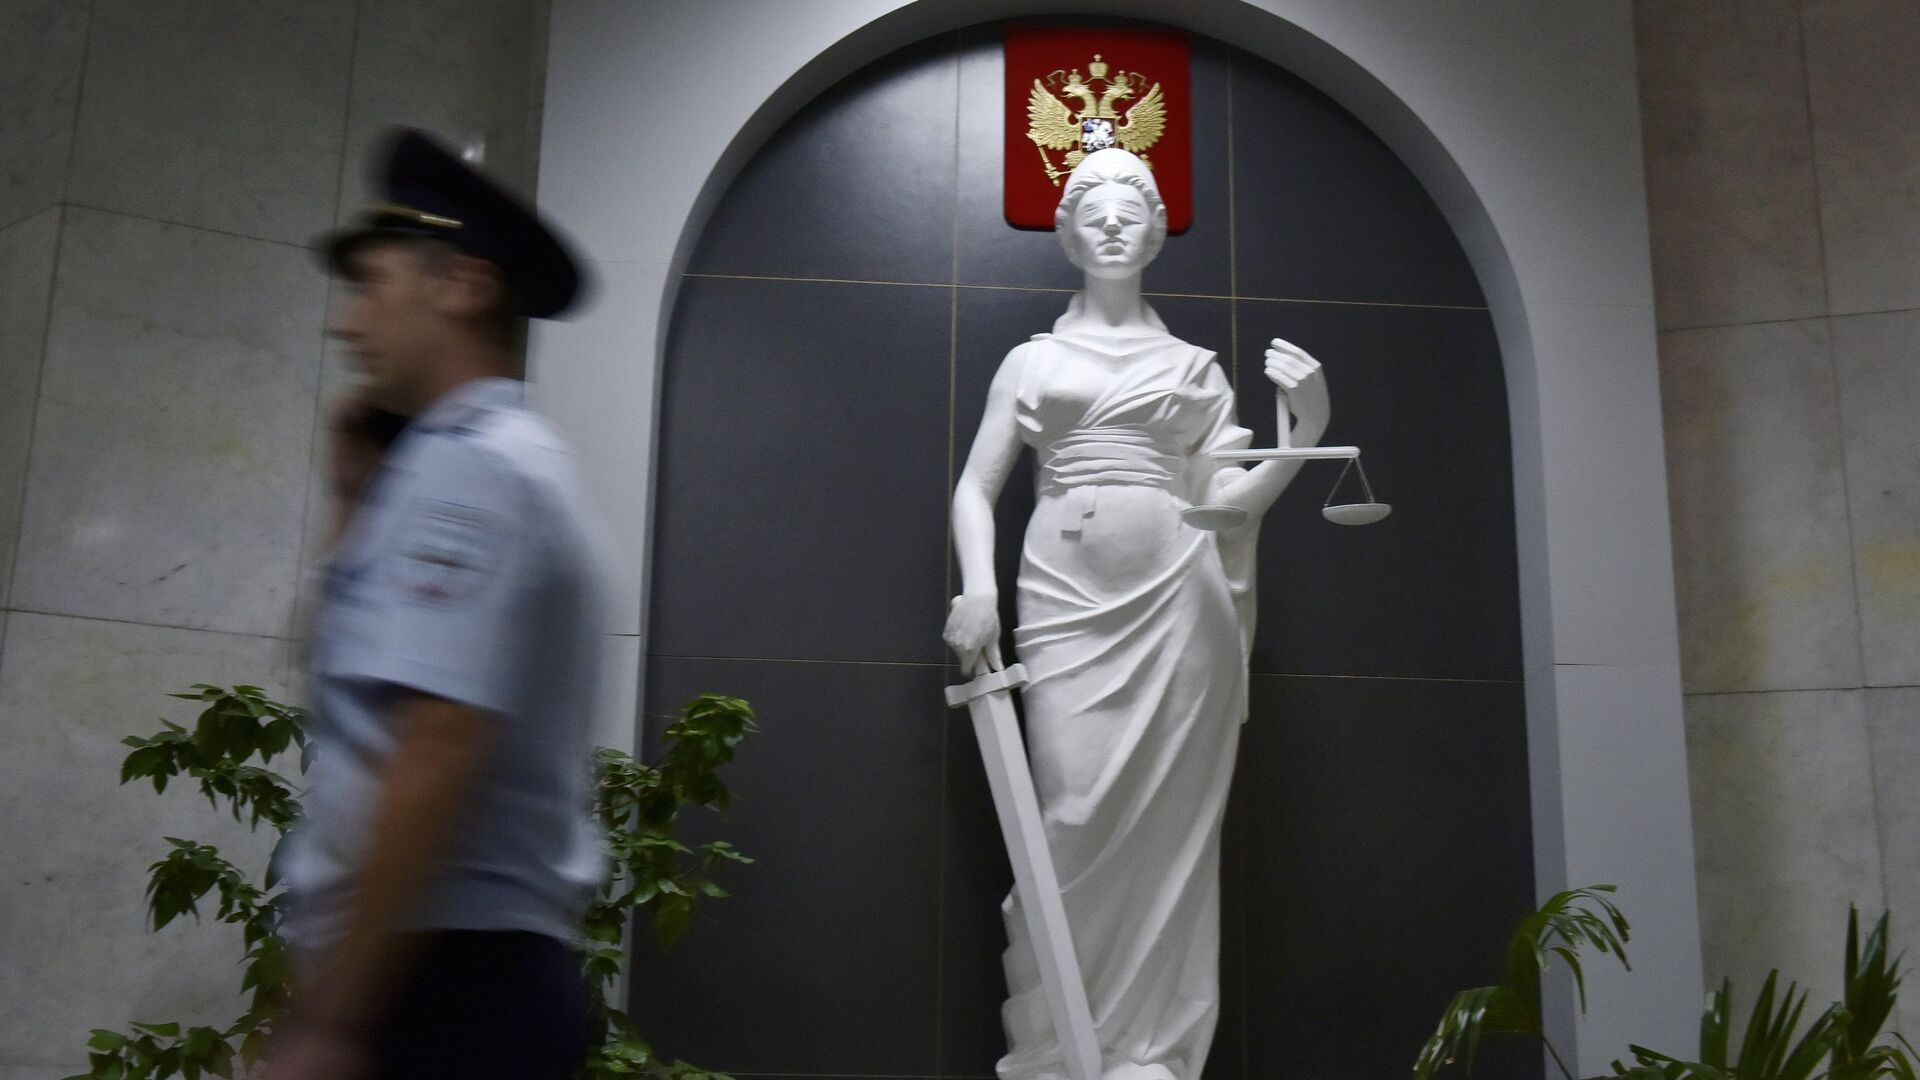 Статуя богини правосудия (Фемида) в здании суда - РИА Новости, 1920, 11.12.2020